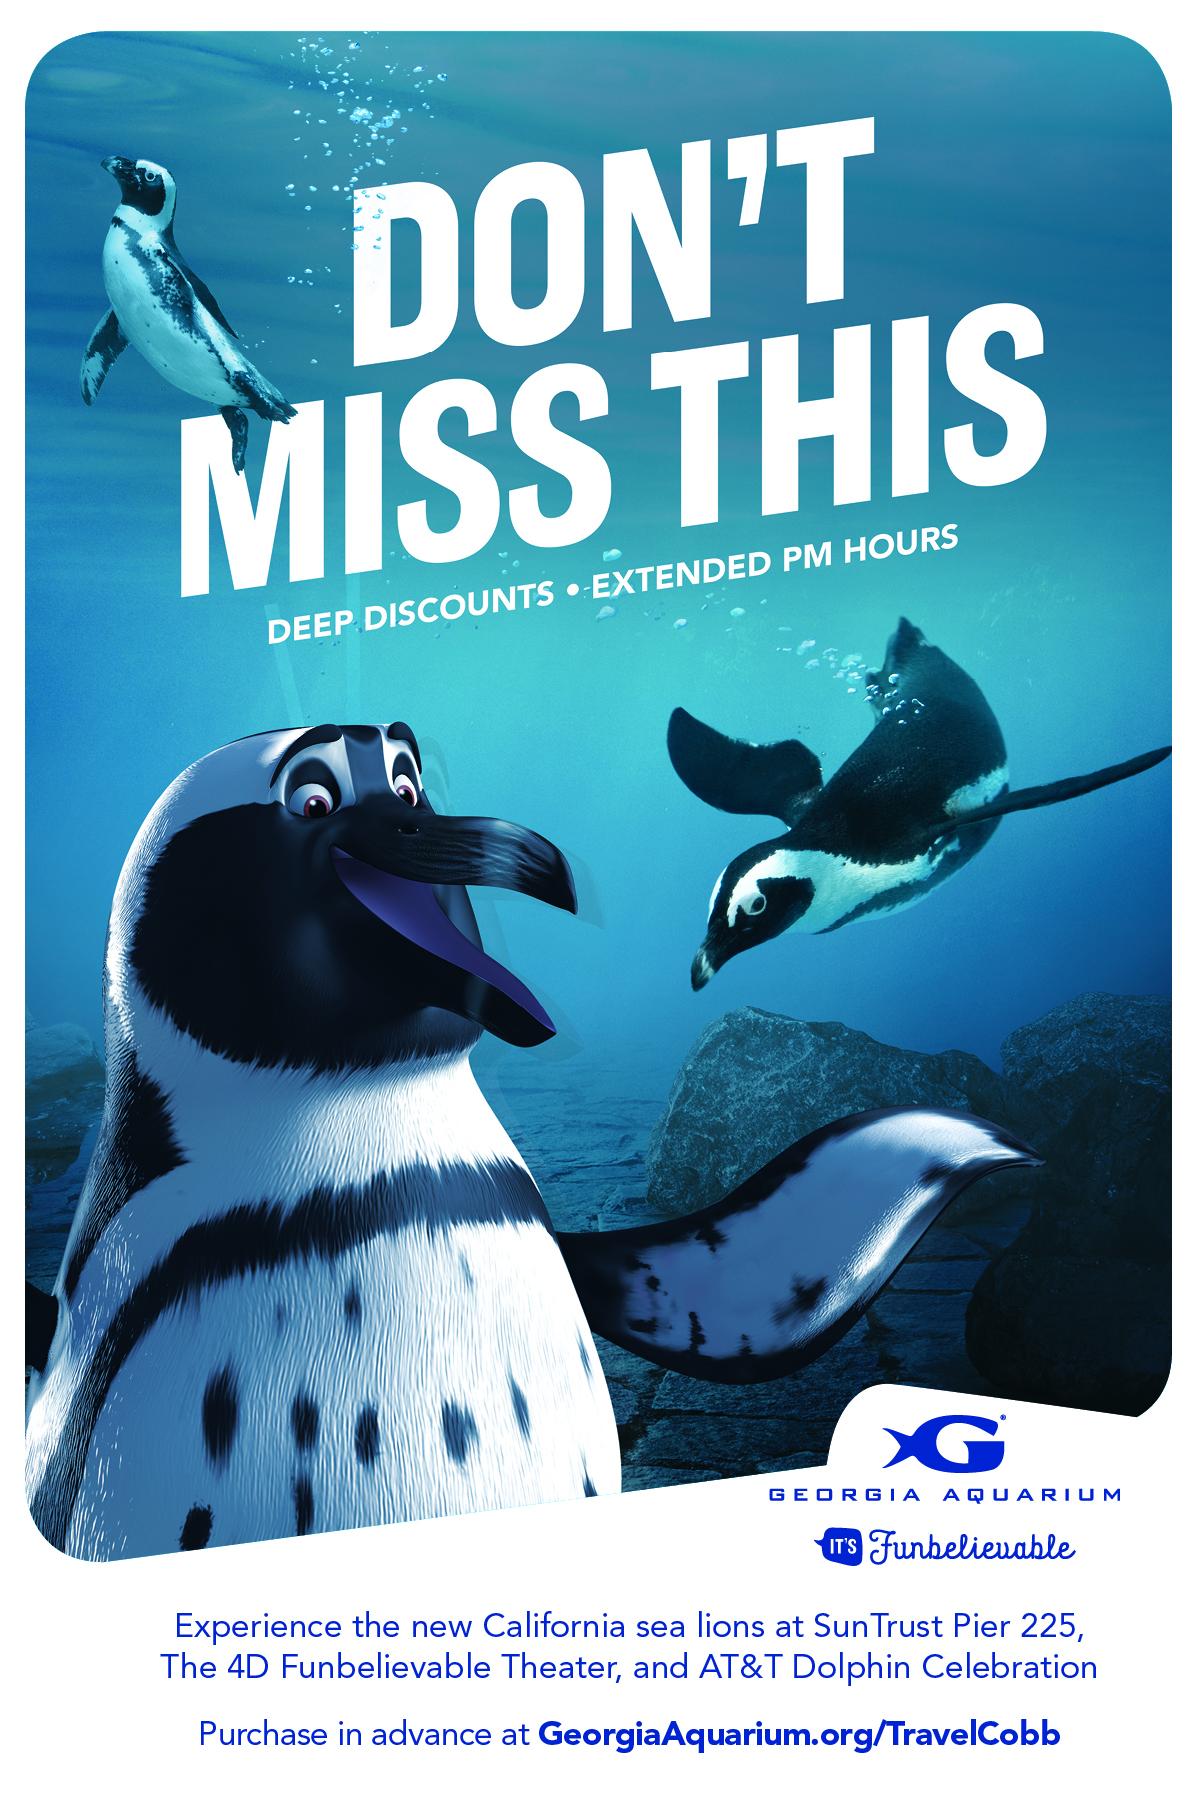 Discounted tickets to the Georgia Aquarium!!!